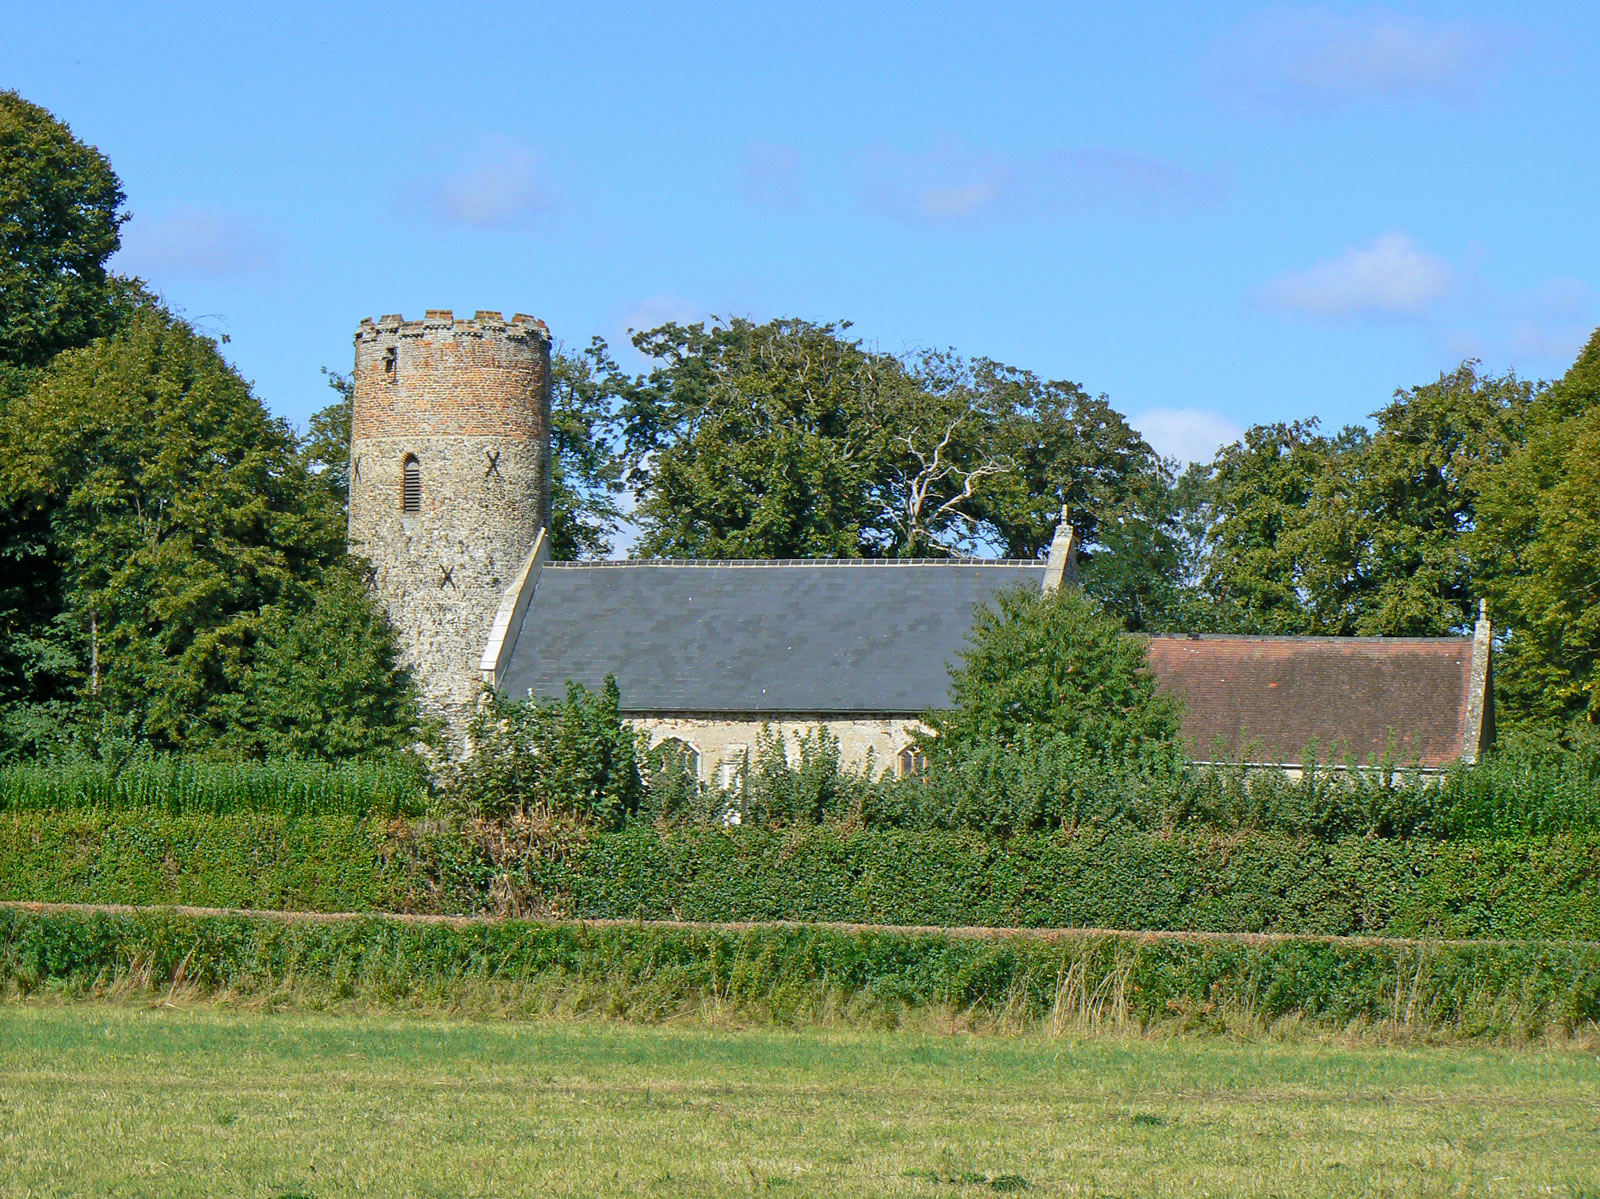 Burgh Castle Norfolk Suffolk Border Including Roman Fort